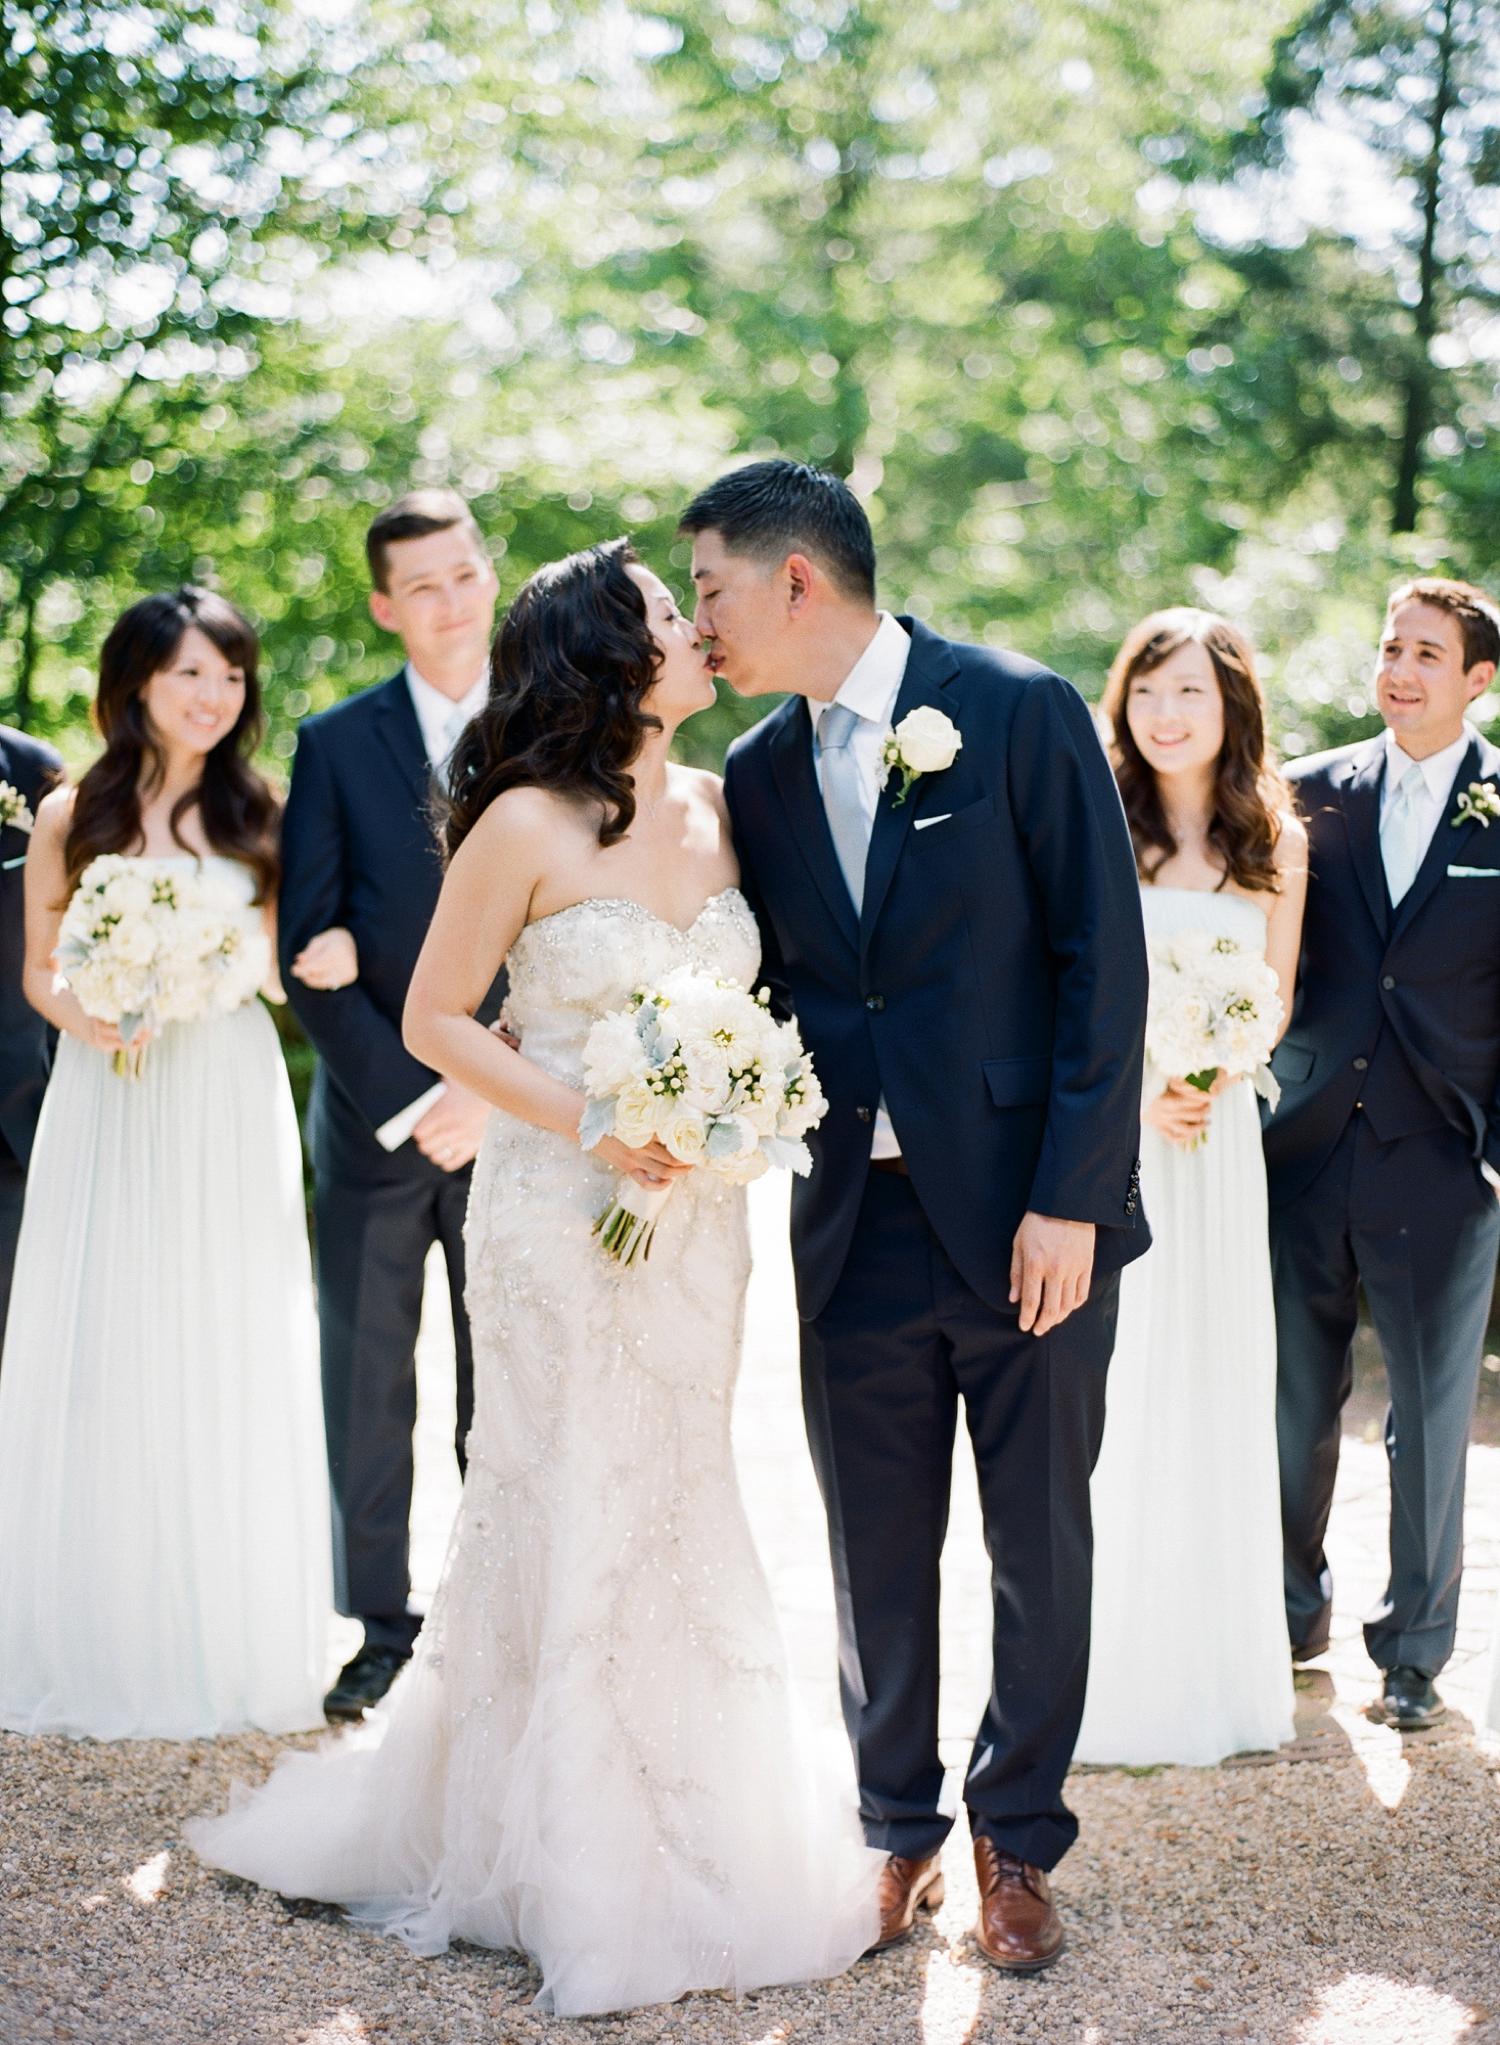 tudor place wedding photography on film